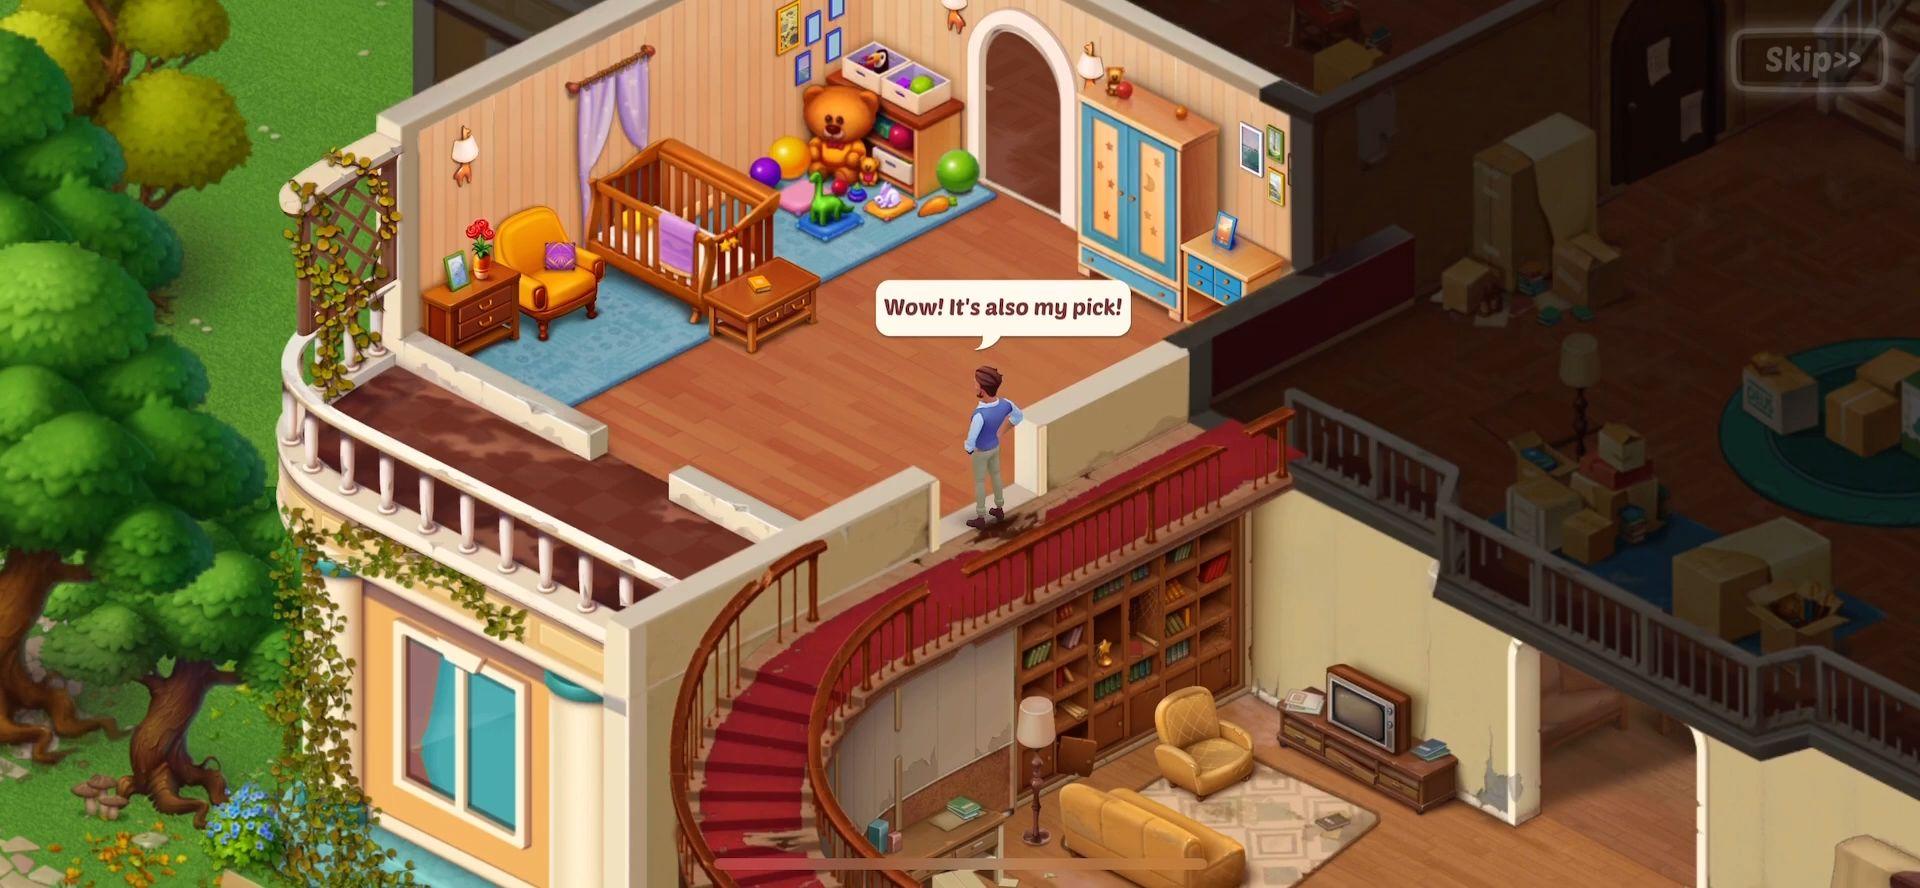 Baby Manor: Baby Raising Simulation & Home Design скріншот 1